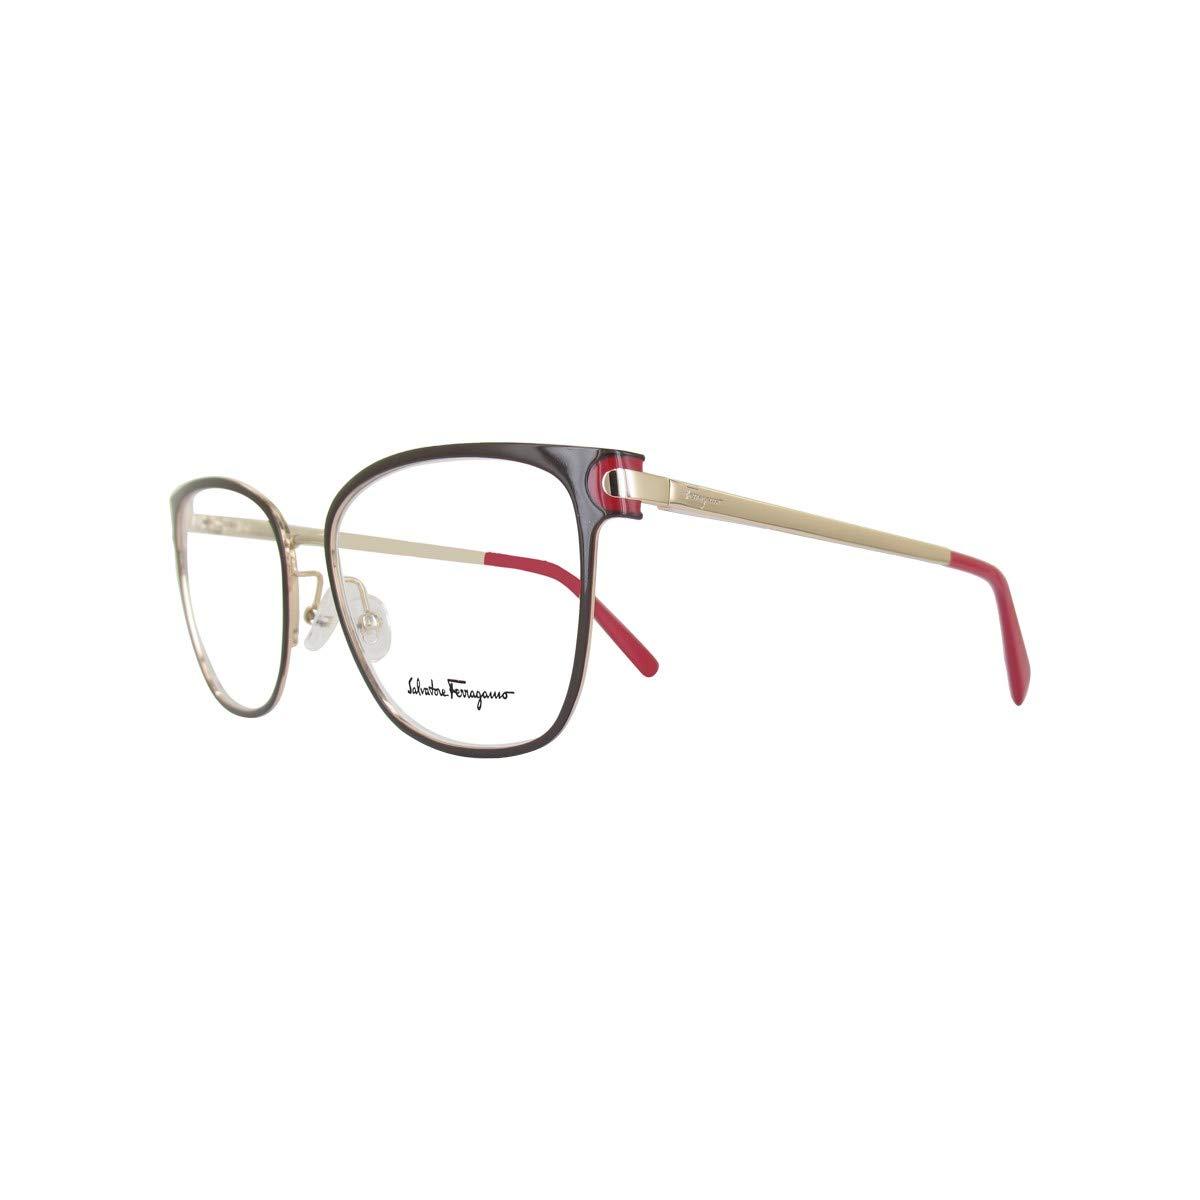 559760510c5 Amazon.com  Eyeglasses FERRAGAMO SF2150 251 BROWN-SHINY GOLD  Clothing